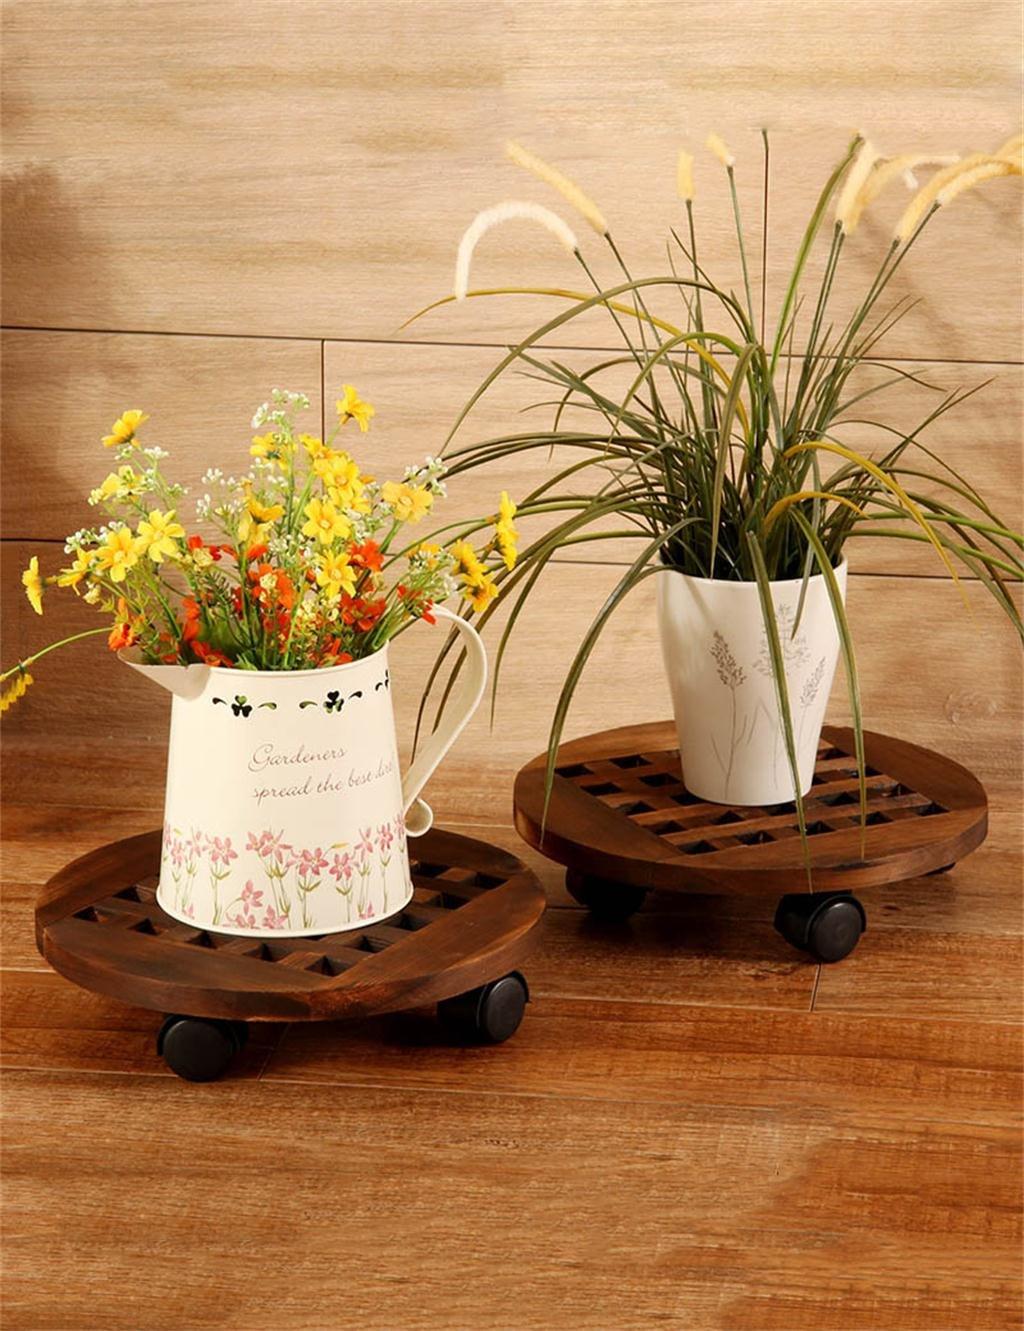 LB huajia ZHANWEI Runder Boden Mobile Massivholz Blumentopf Regal Blumenrahmen Blumentopf Halter Balkon mit Rad Packung 2